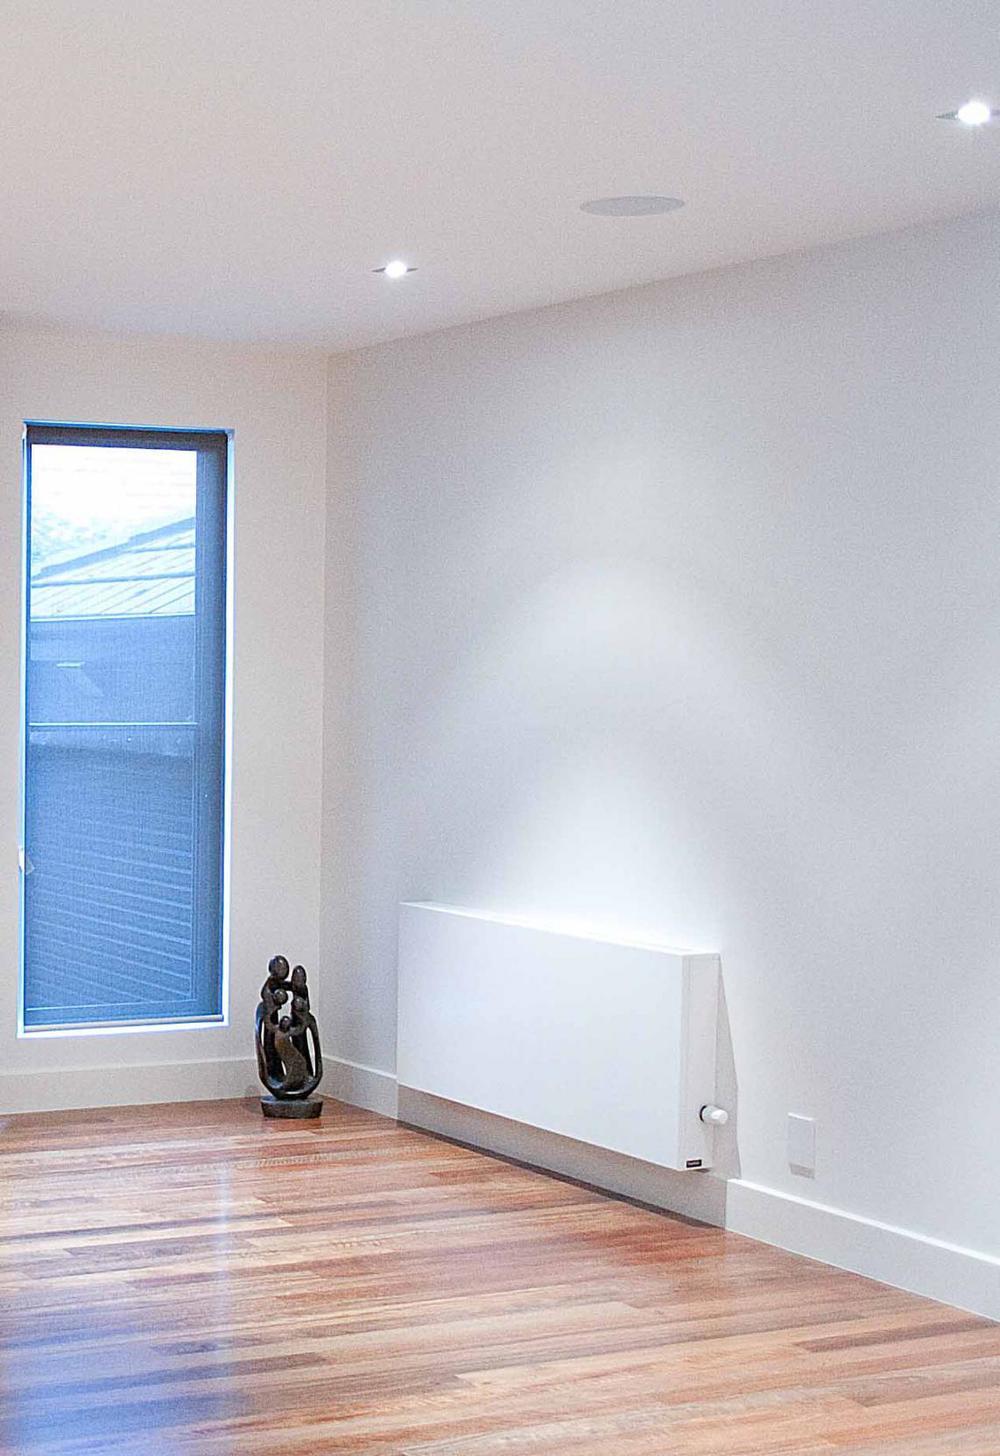 hydronic radiator wall panel heater.JPG